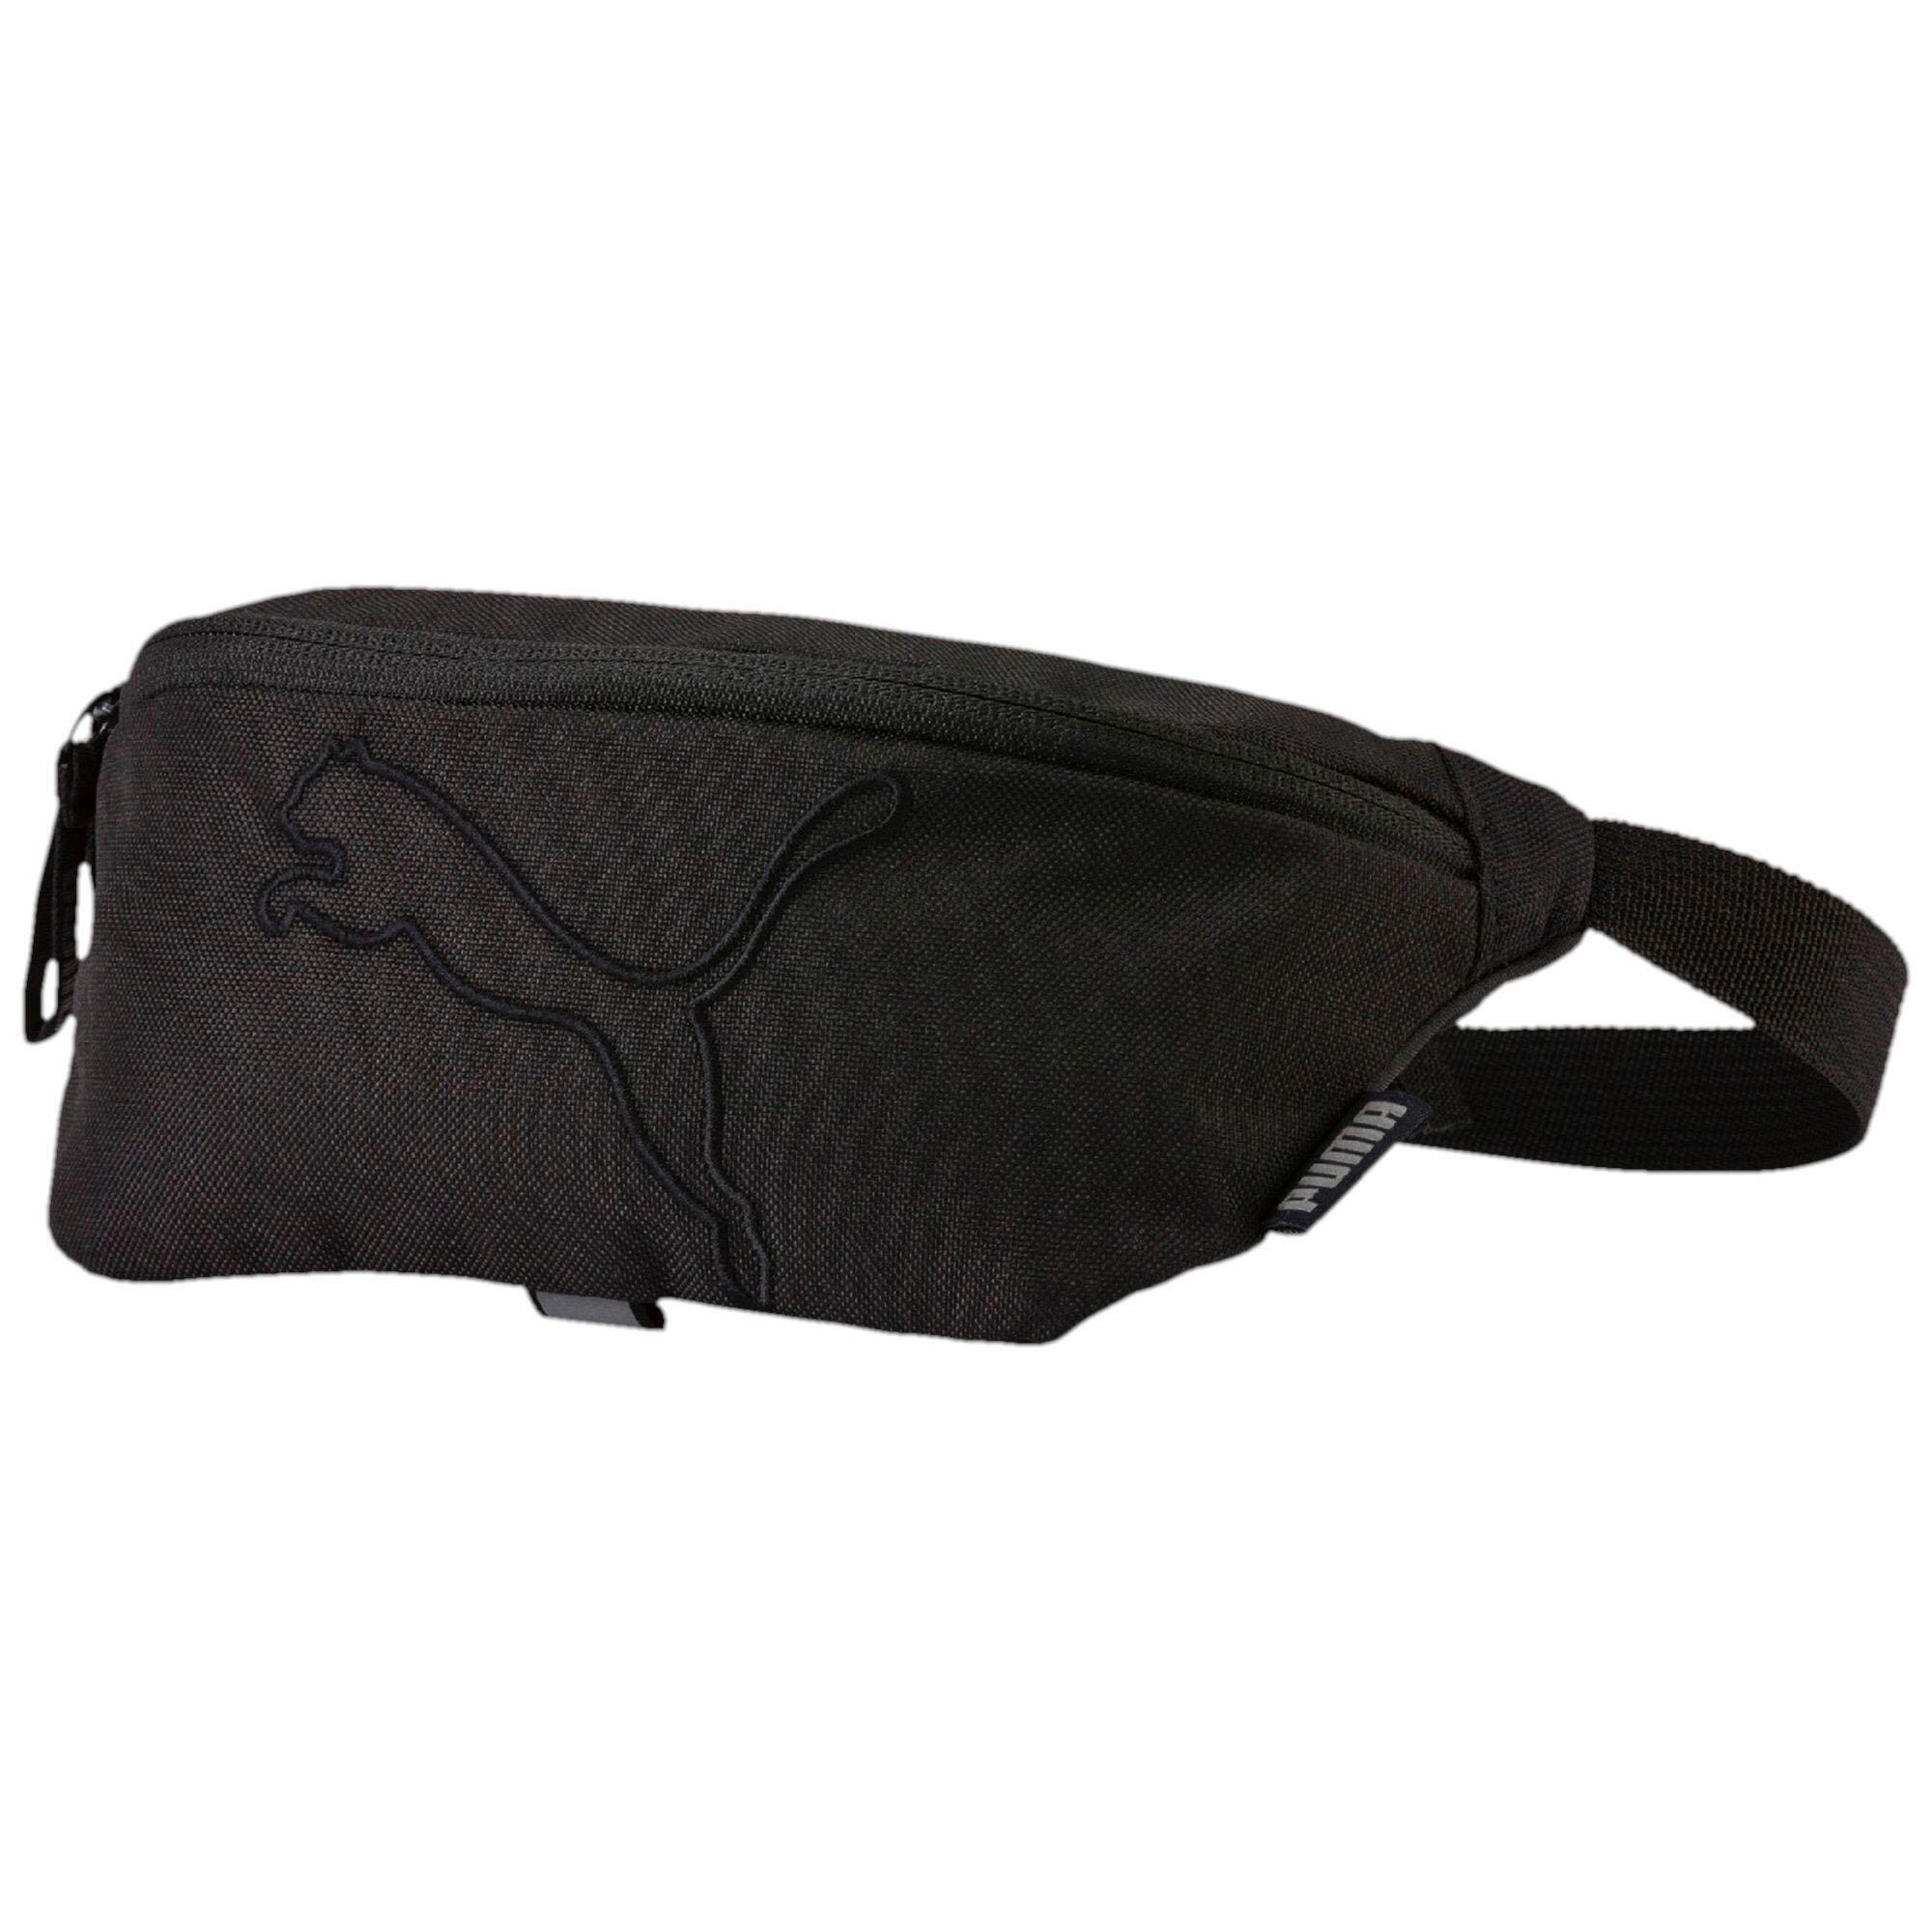 cac0b3cb30 Home · Men s Fashion · Bags   Wallets · Sling Bags. photo photo photo